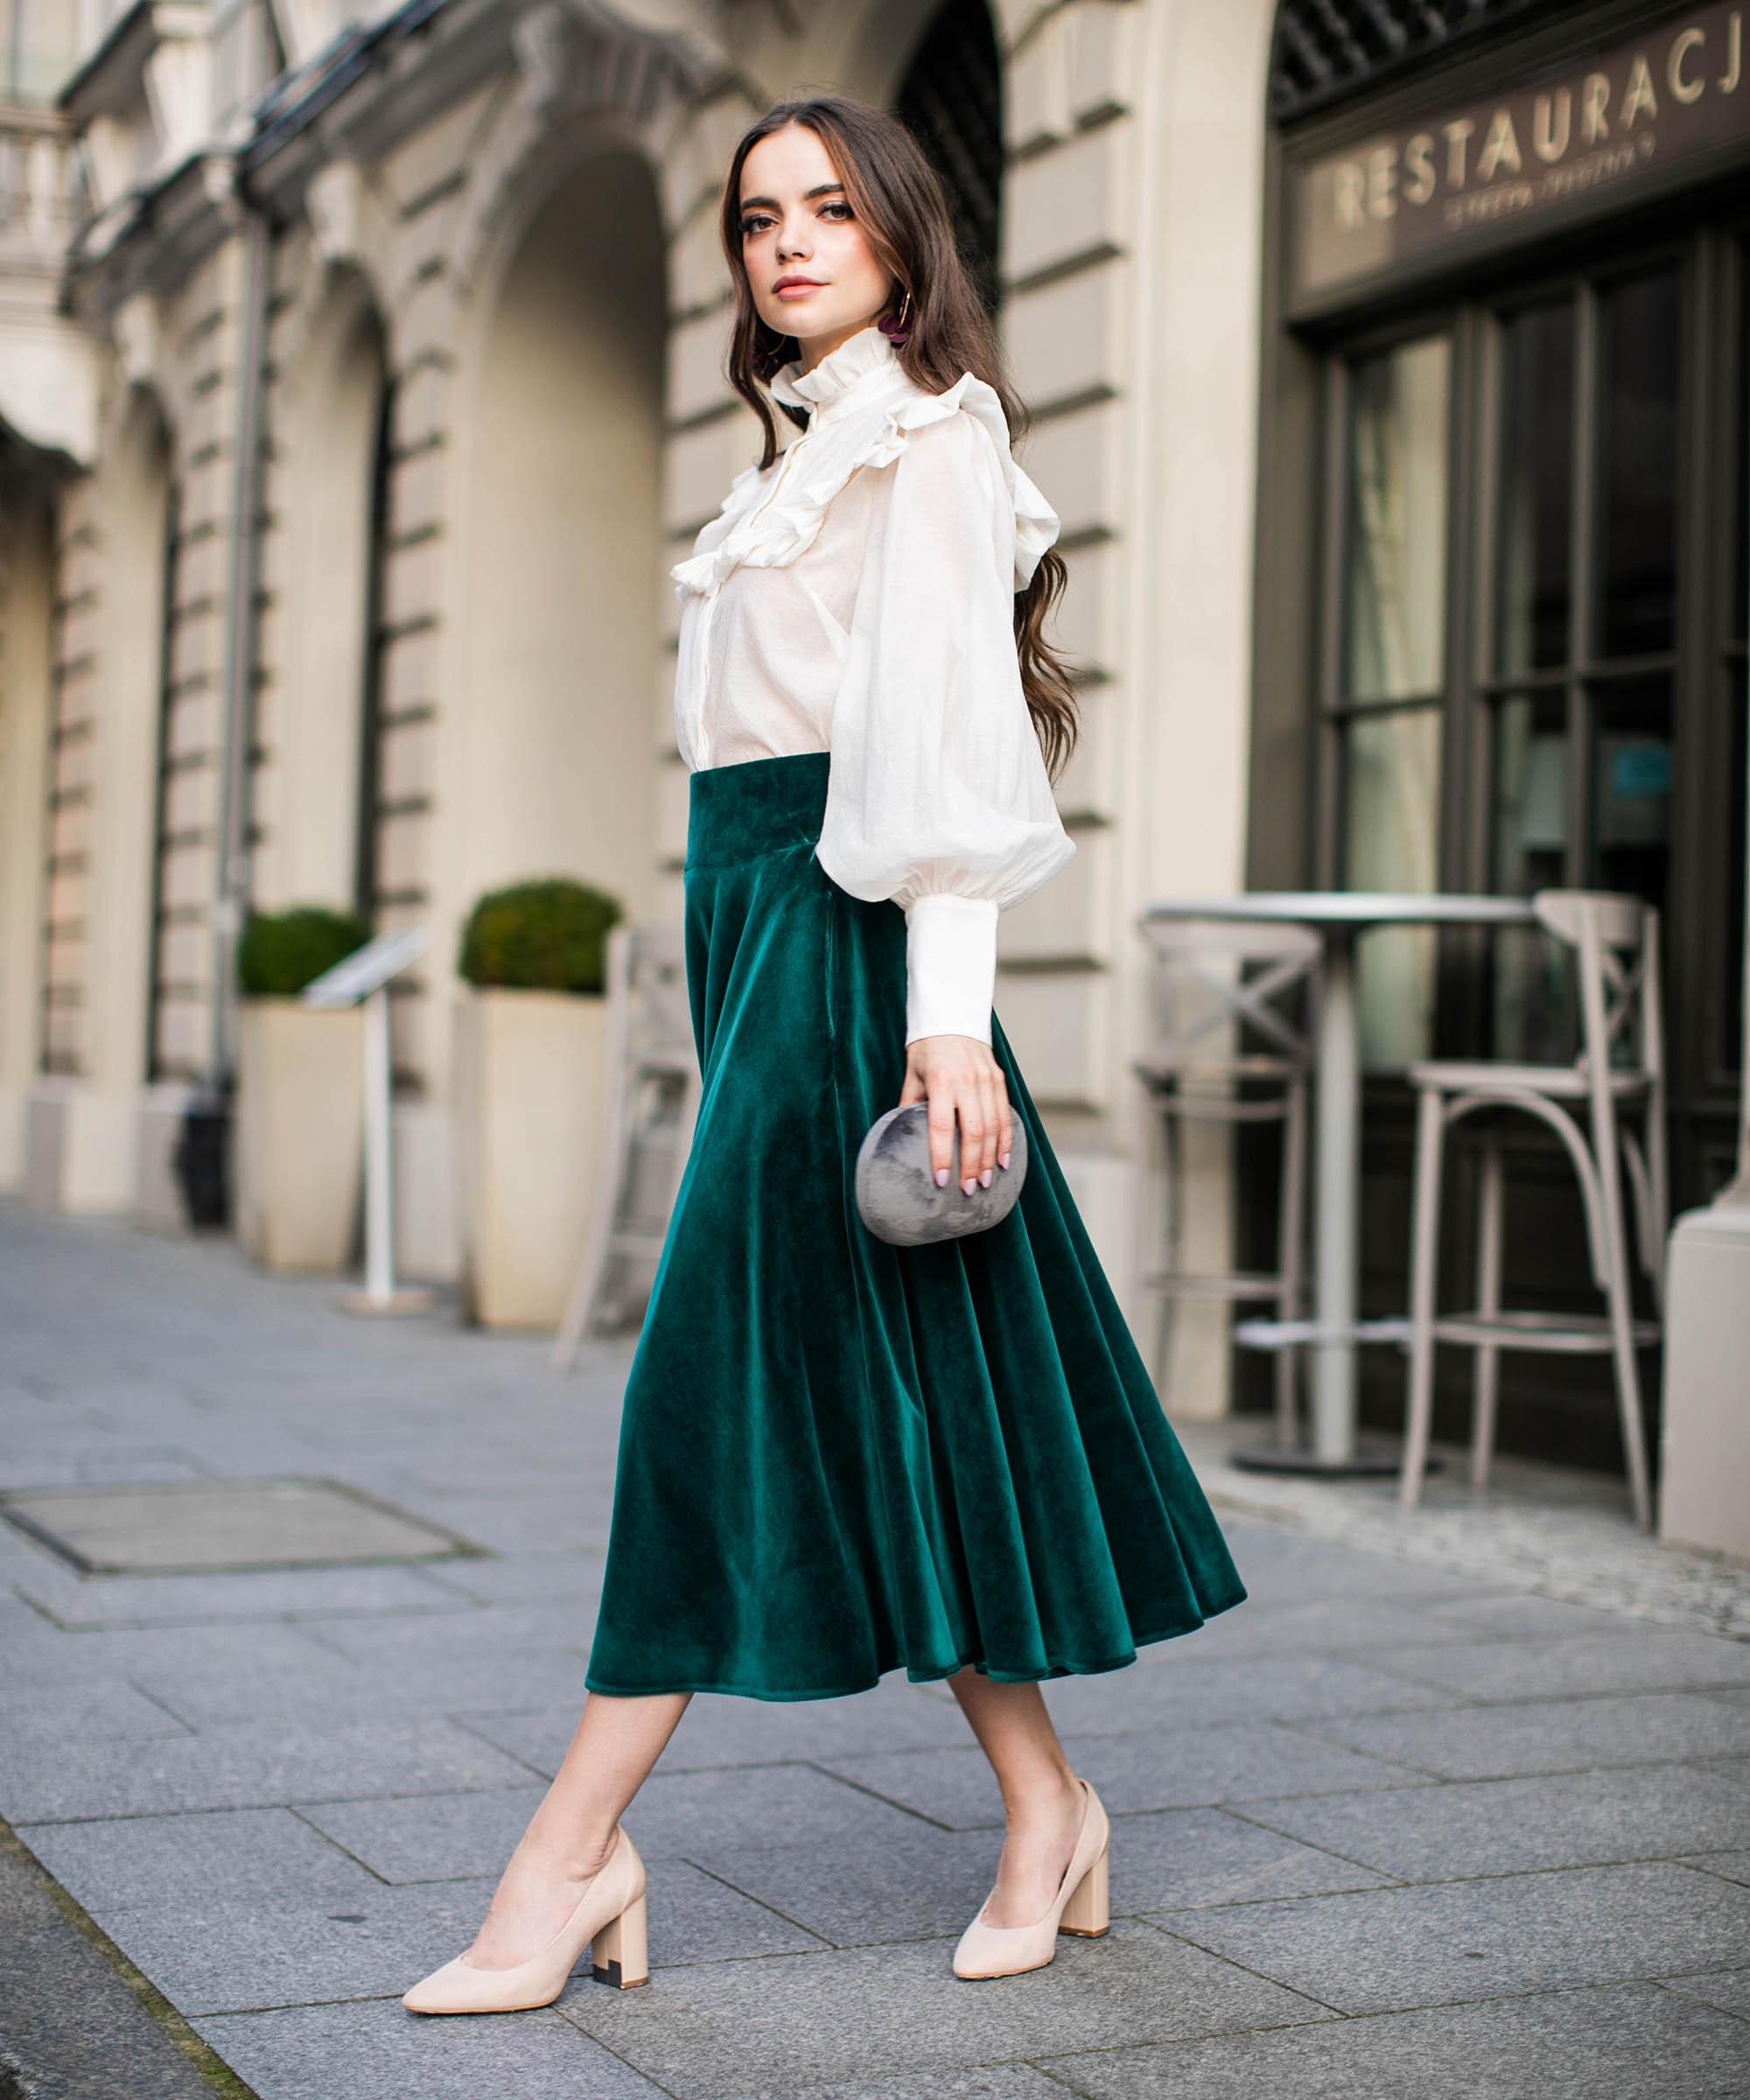 zielona spódnica welurowa